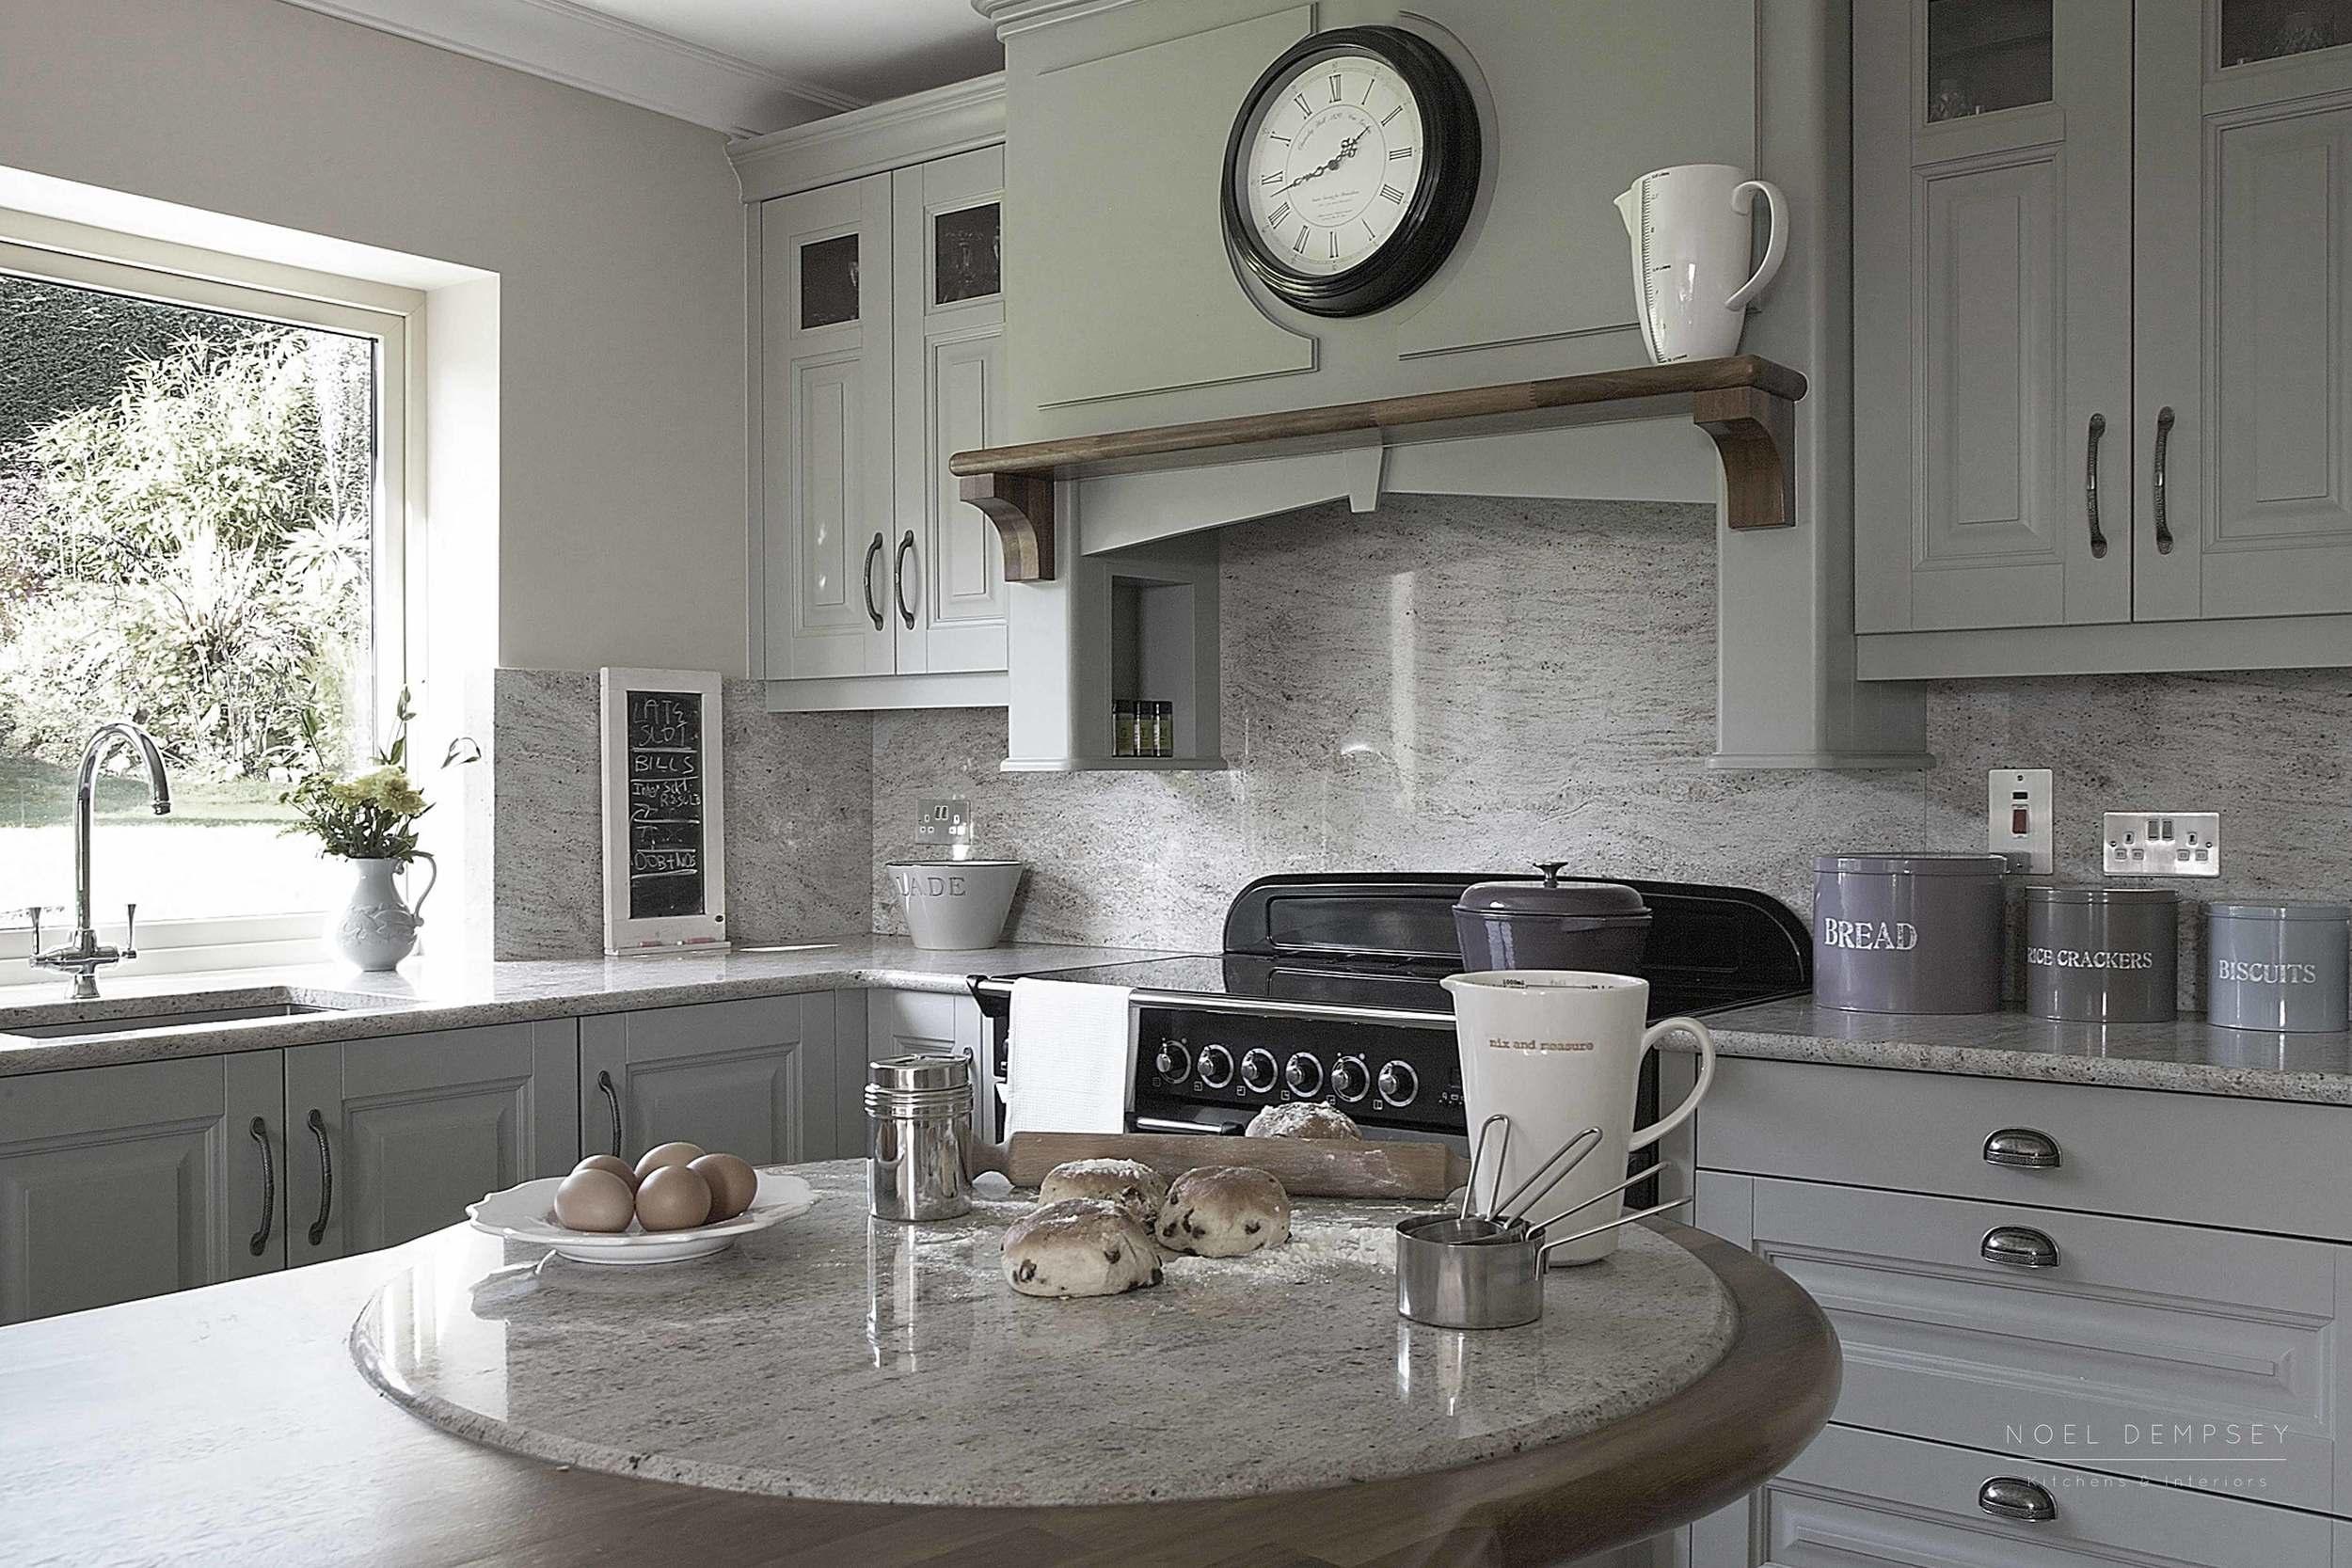 Oceanview-painted-kitchen-greystones-3.jpg